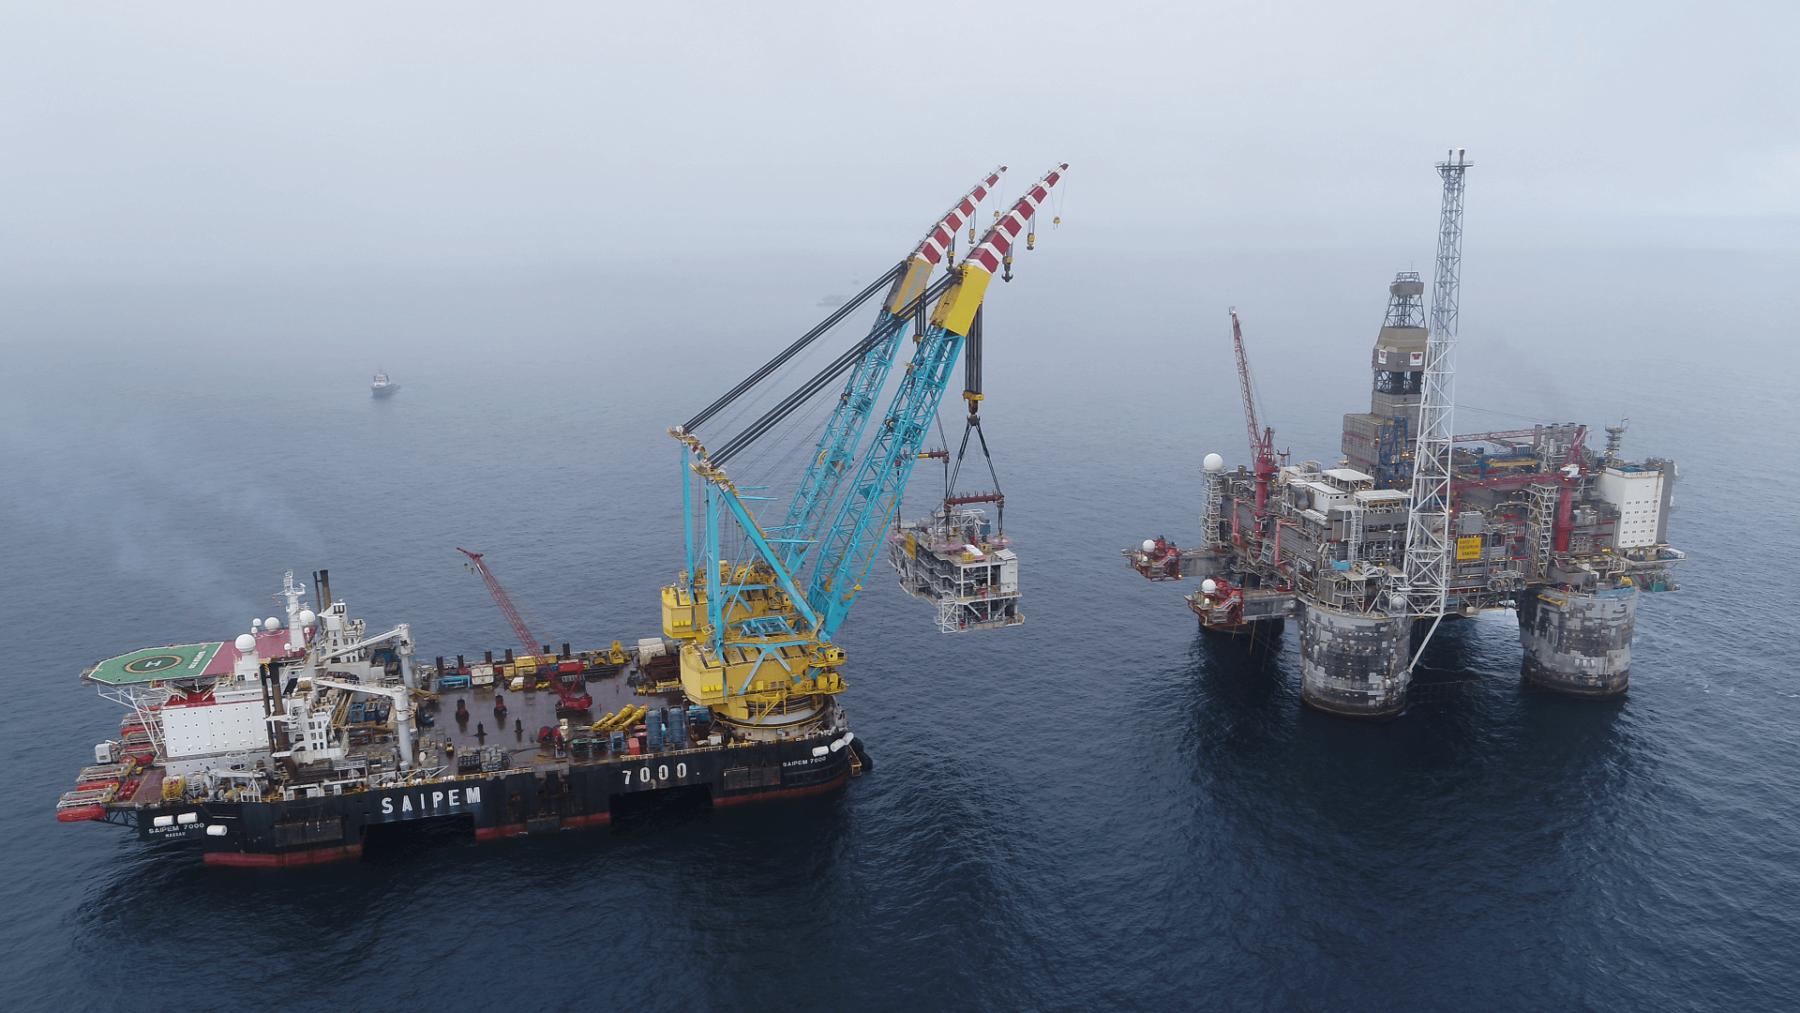 Credit: Wintershall Dea/John Iver Berg - From the Dvalin field development in the North Sea.